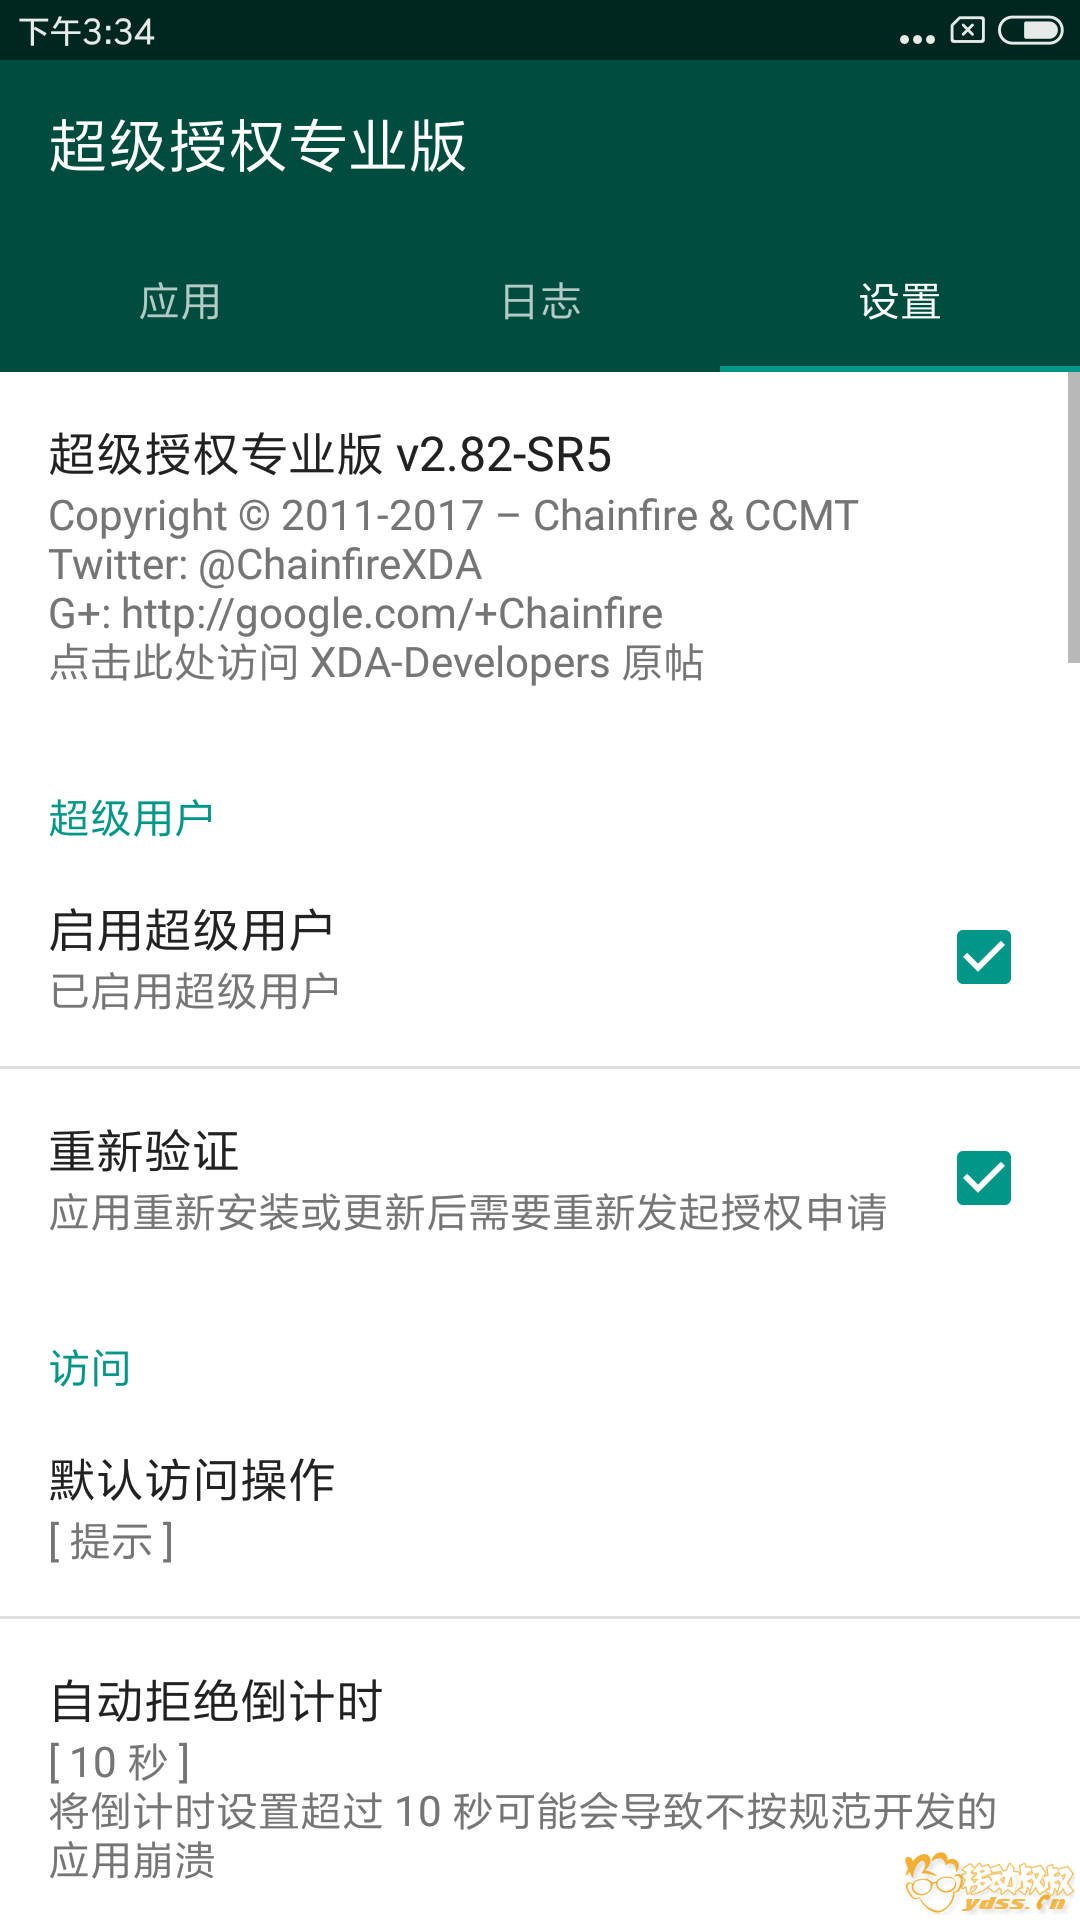 Screenshot_2018-10-10-15-34-25-391_eu.chainfire.supersu.png